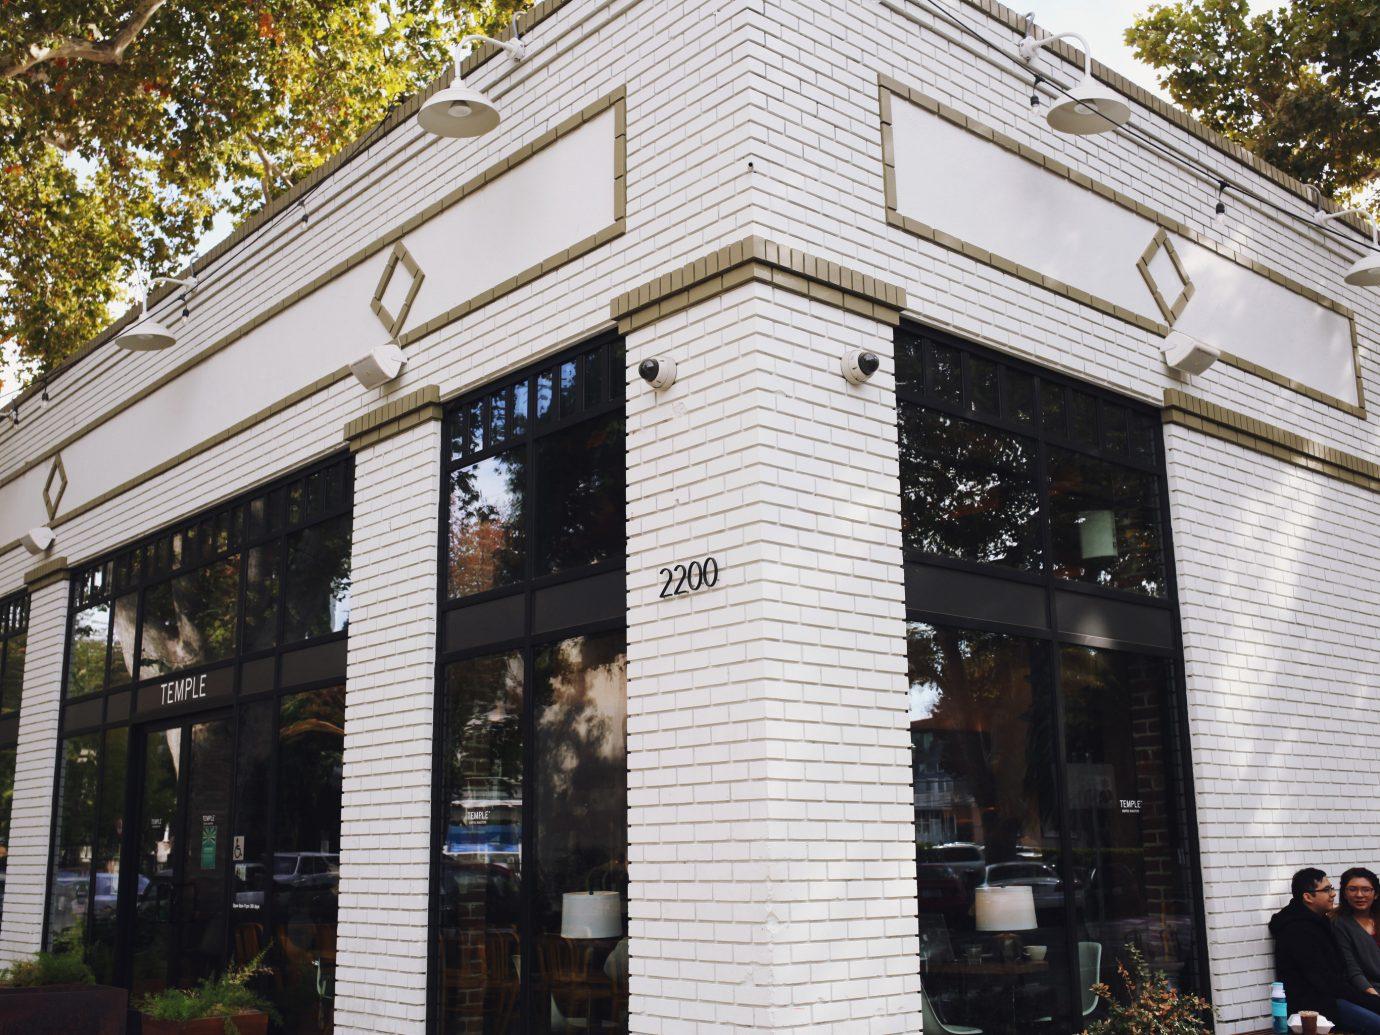 Influencers + Tastemakers building house facade window